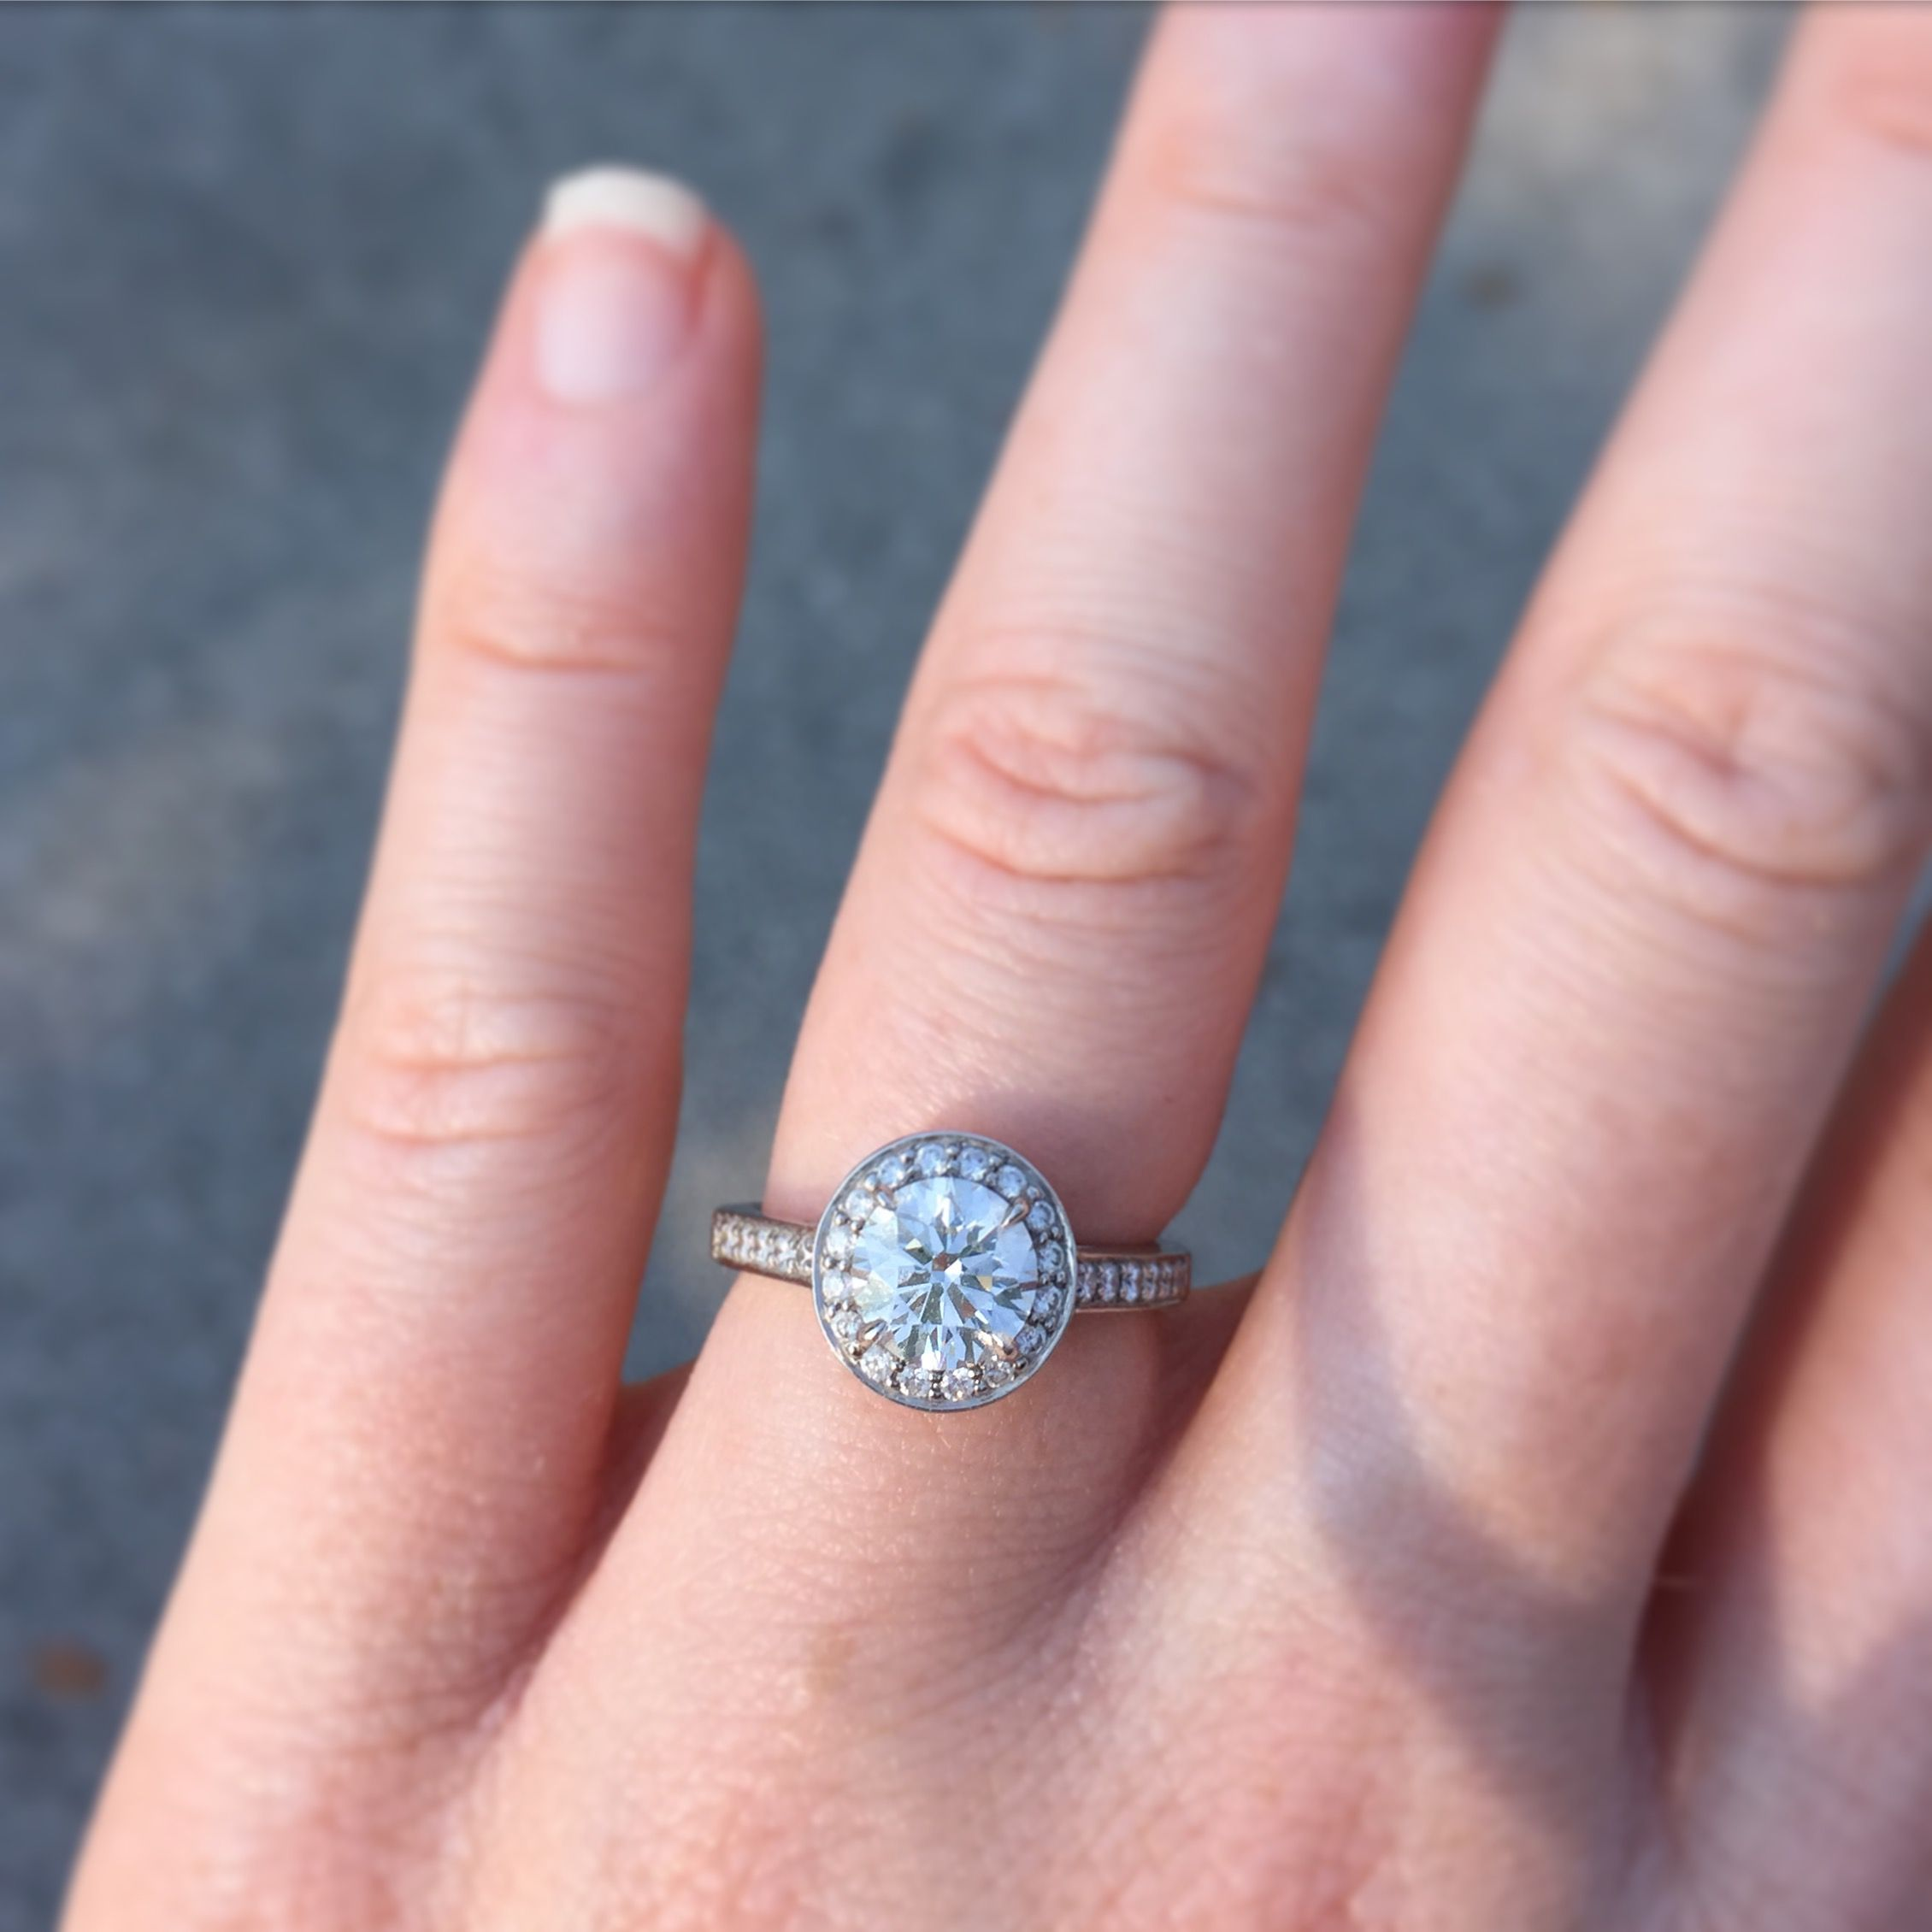 Tiffany Embrace. Center stone: .92 carats, H, VVS2. Halo and band: .22 carats, D-F, VVS1. Size 4 | http://www.tiffany.com/Engagement/item.aspx?GroupSku=GRP10055&selectedSku=25485955